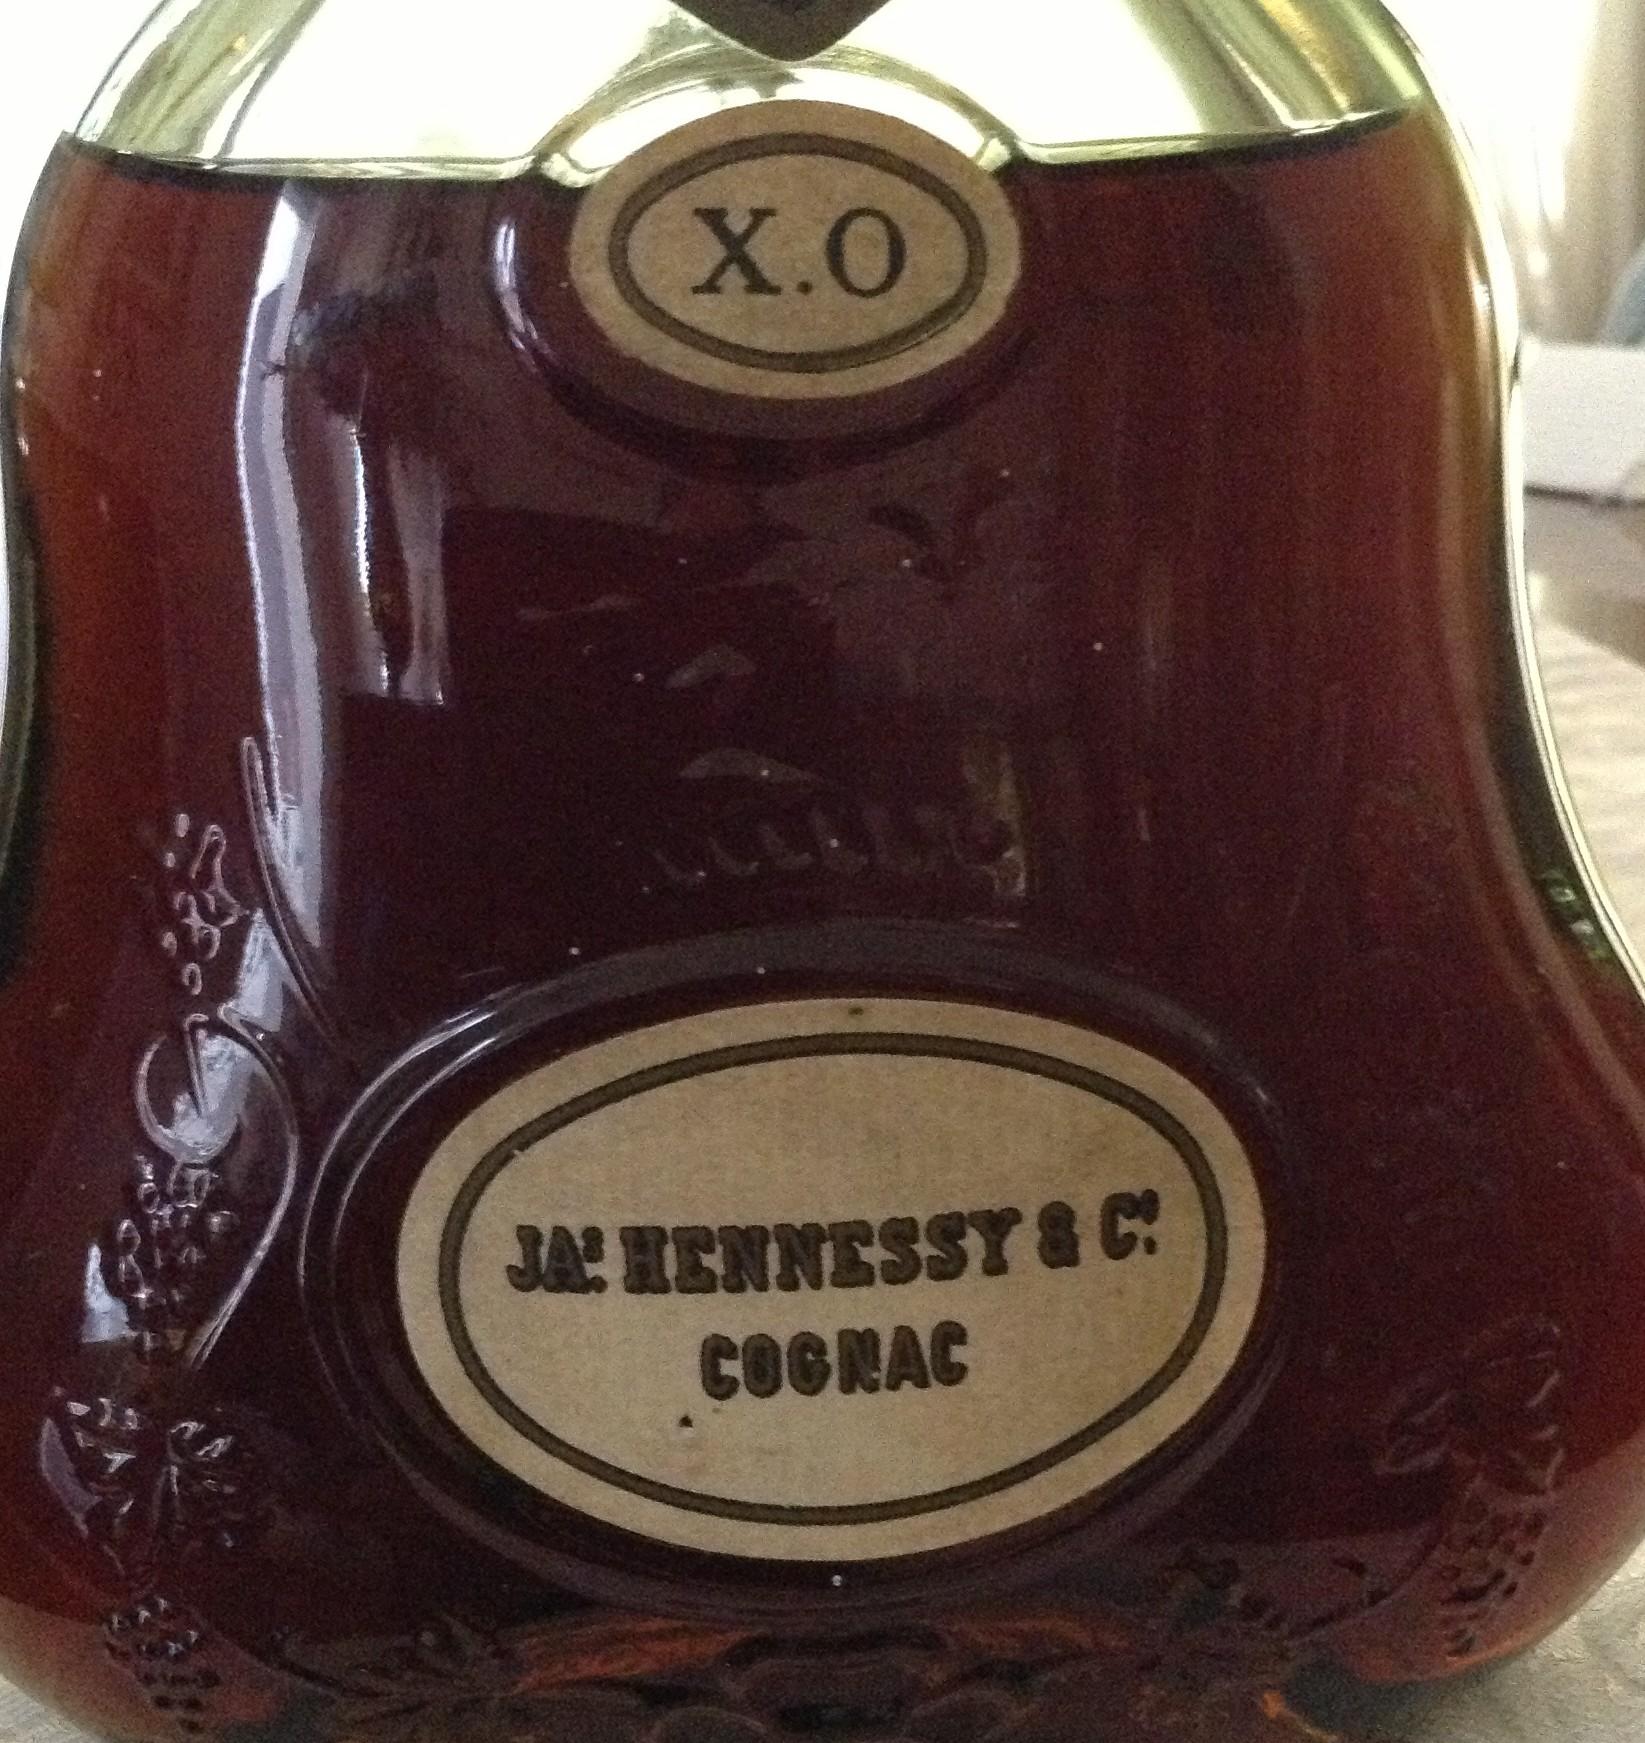 Hennessy XO Cognac